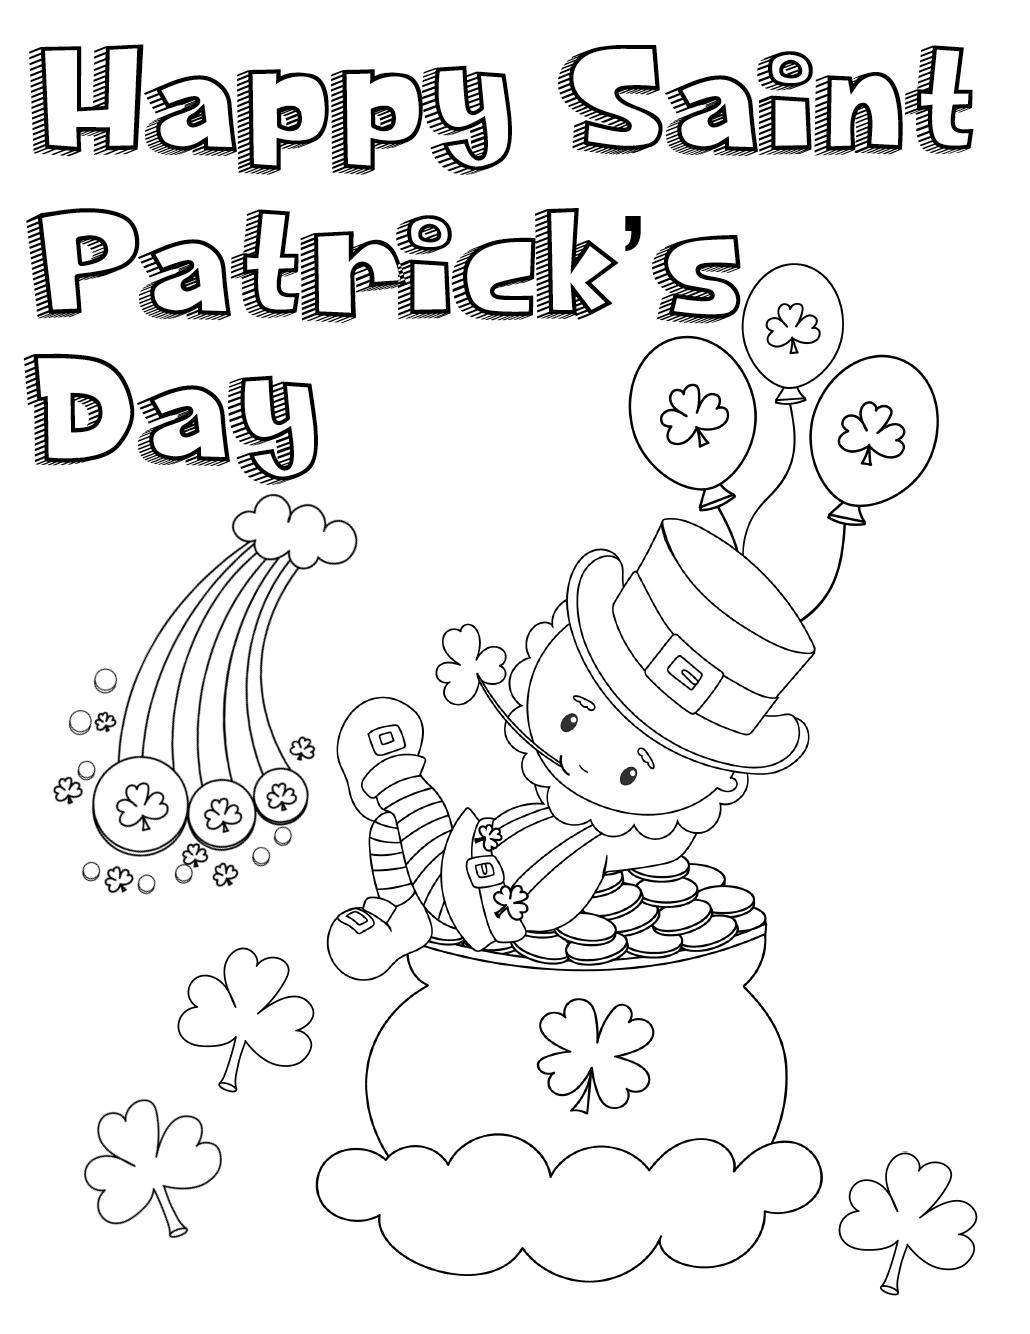 Free St Patrick's Day Printables